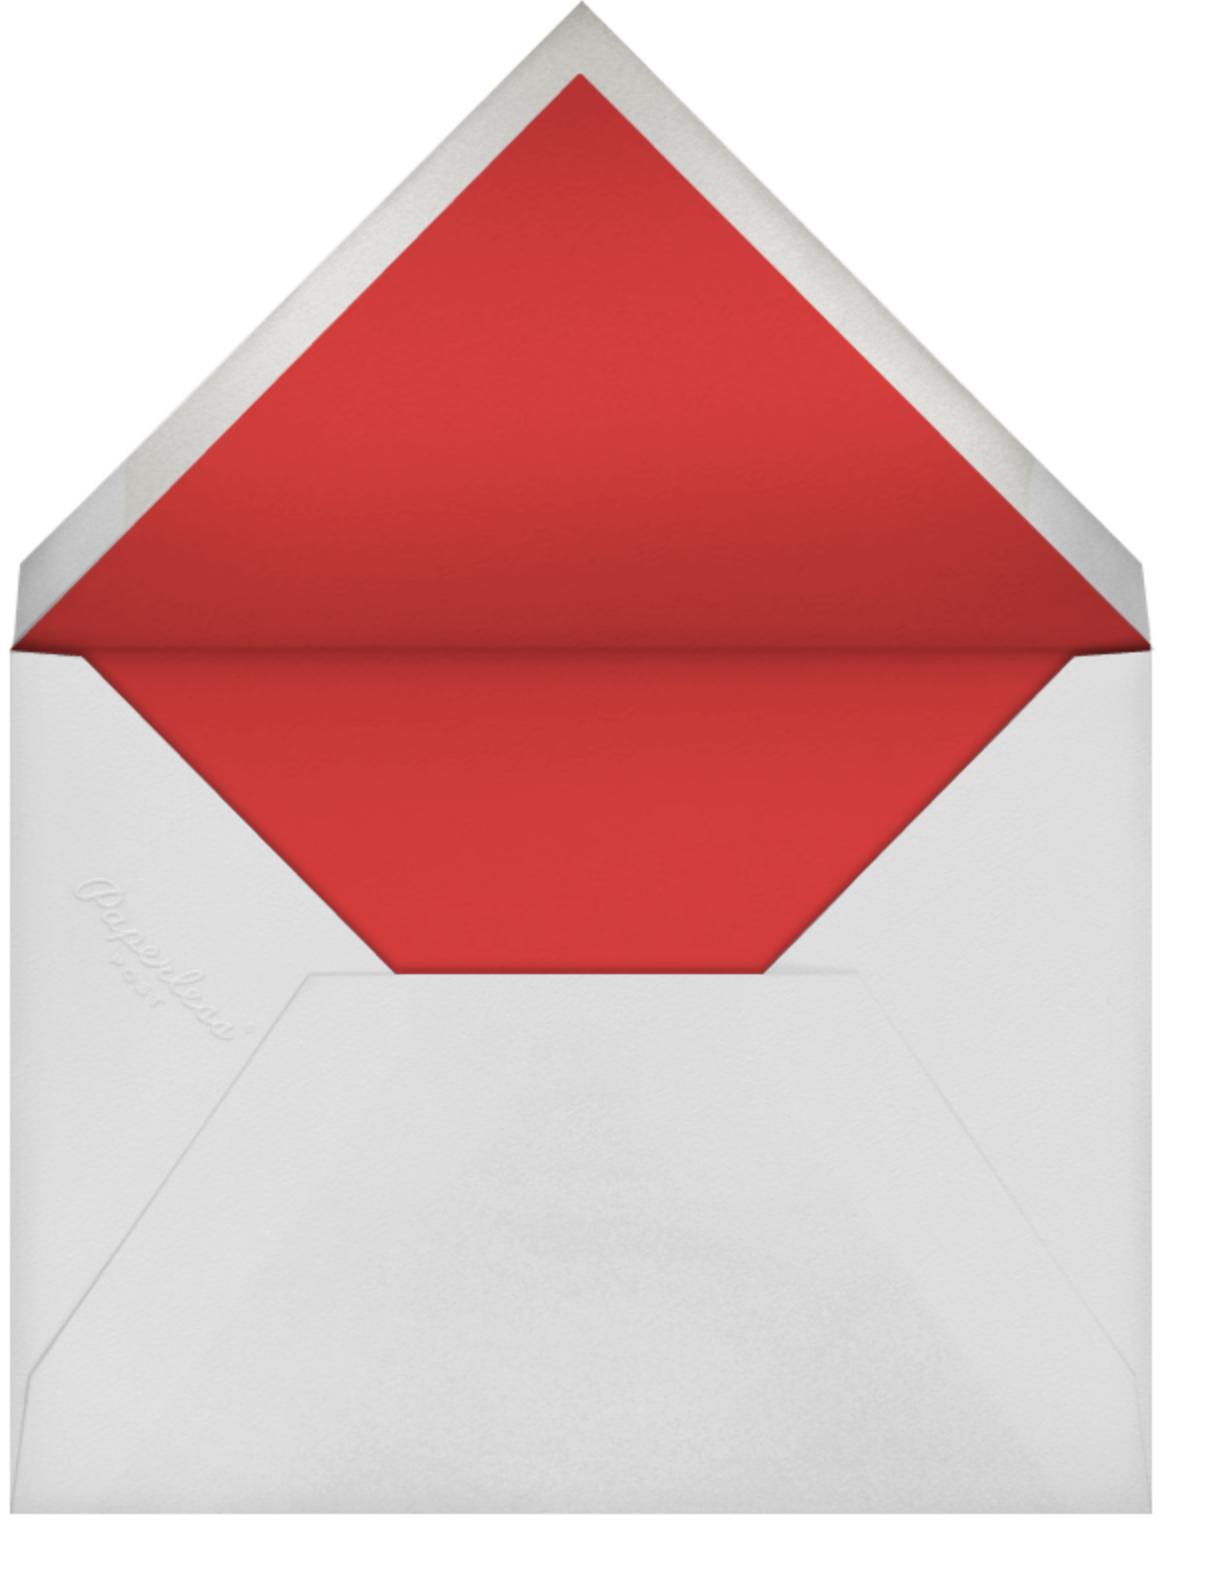 Botanical Dot - White (Thank You) - Oscar de la Renta - Personalized stationery - envelope back